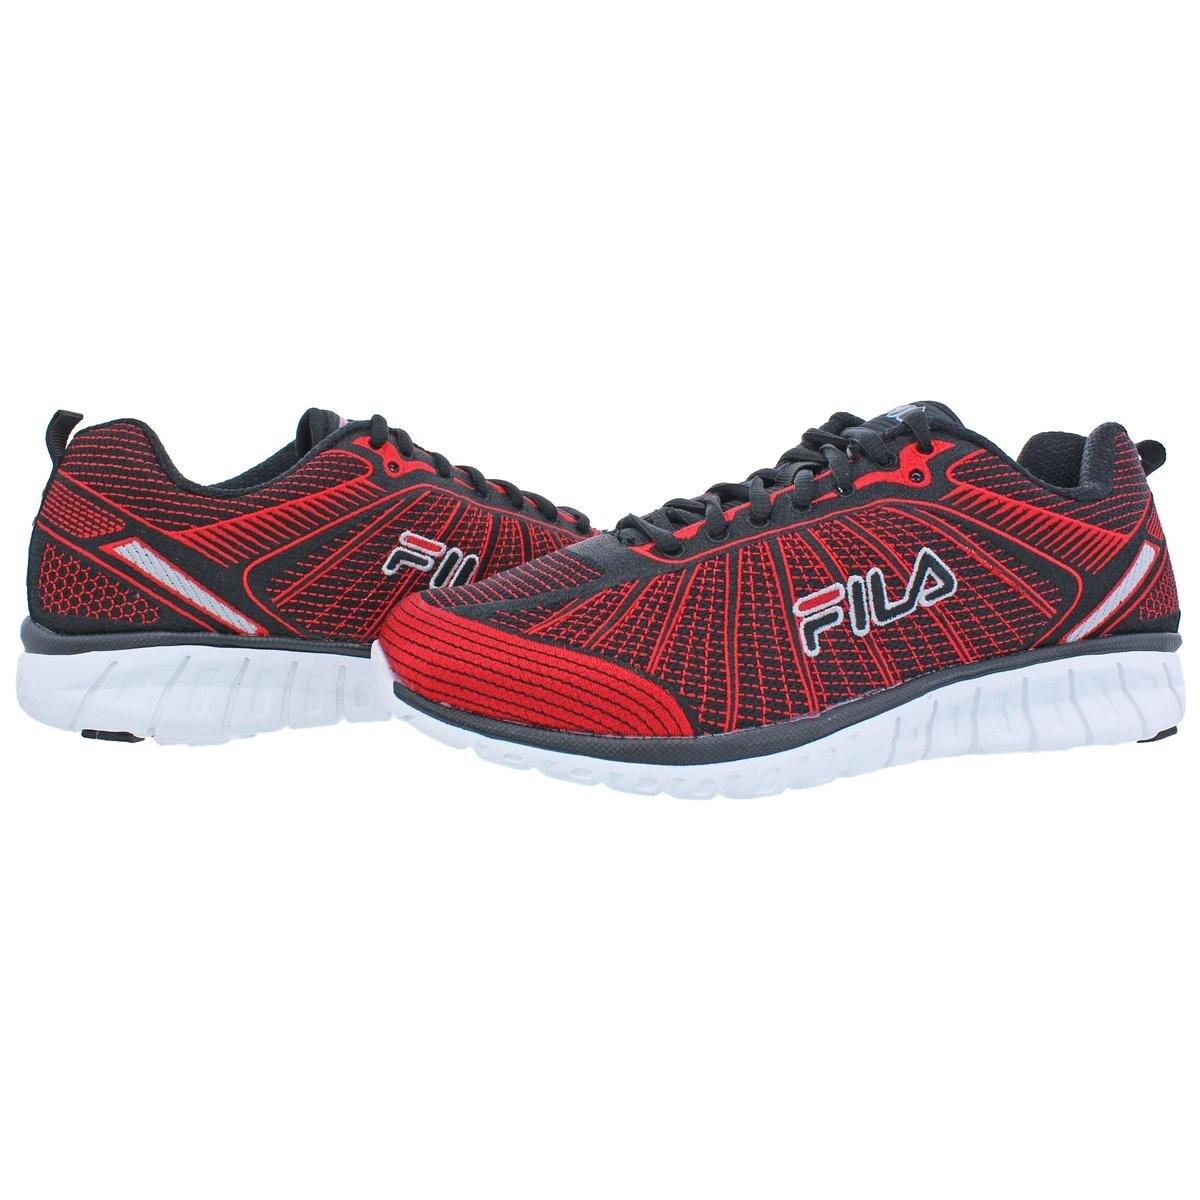 8d1e3eb7eda0 Shop Fila Mens Speedweave Run II Running Shoes Training Lightweight - 9  medium (d) - Free Shipping On Orders Over  45 - Overstock - 22732968